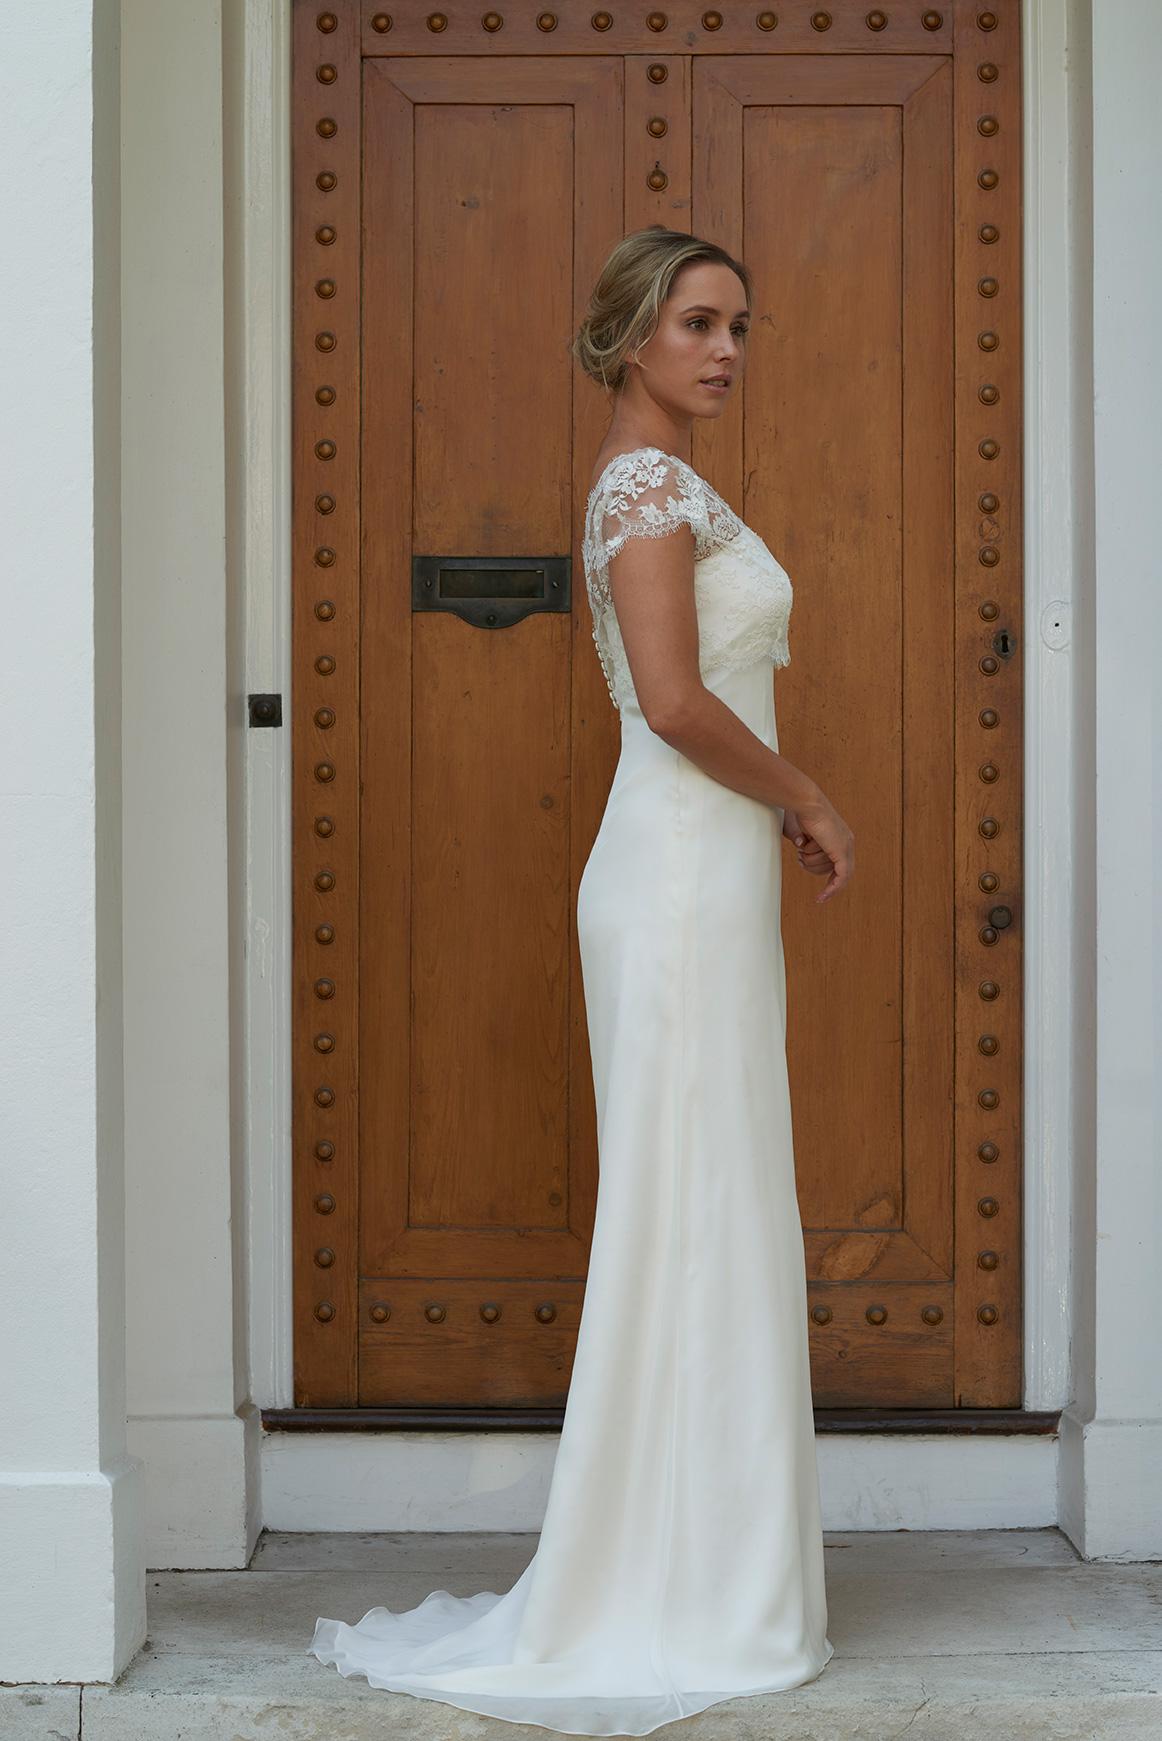 Alice_dress_doorside-web.jpg